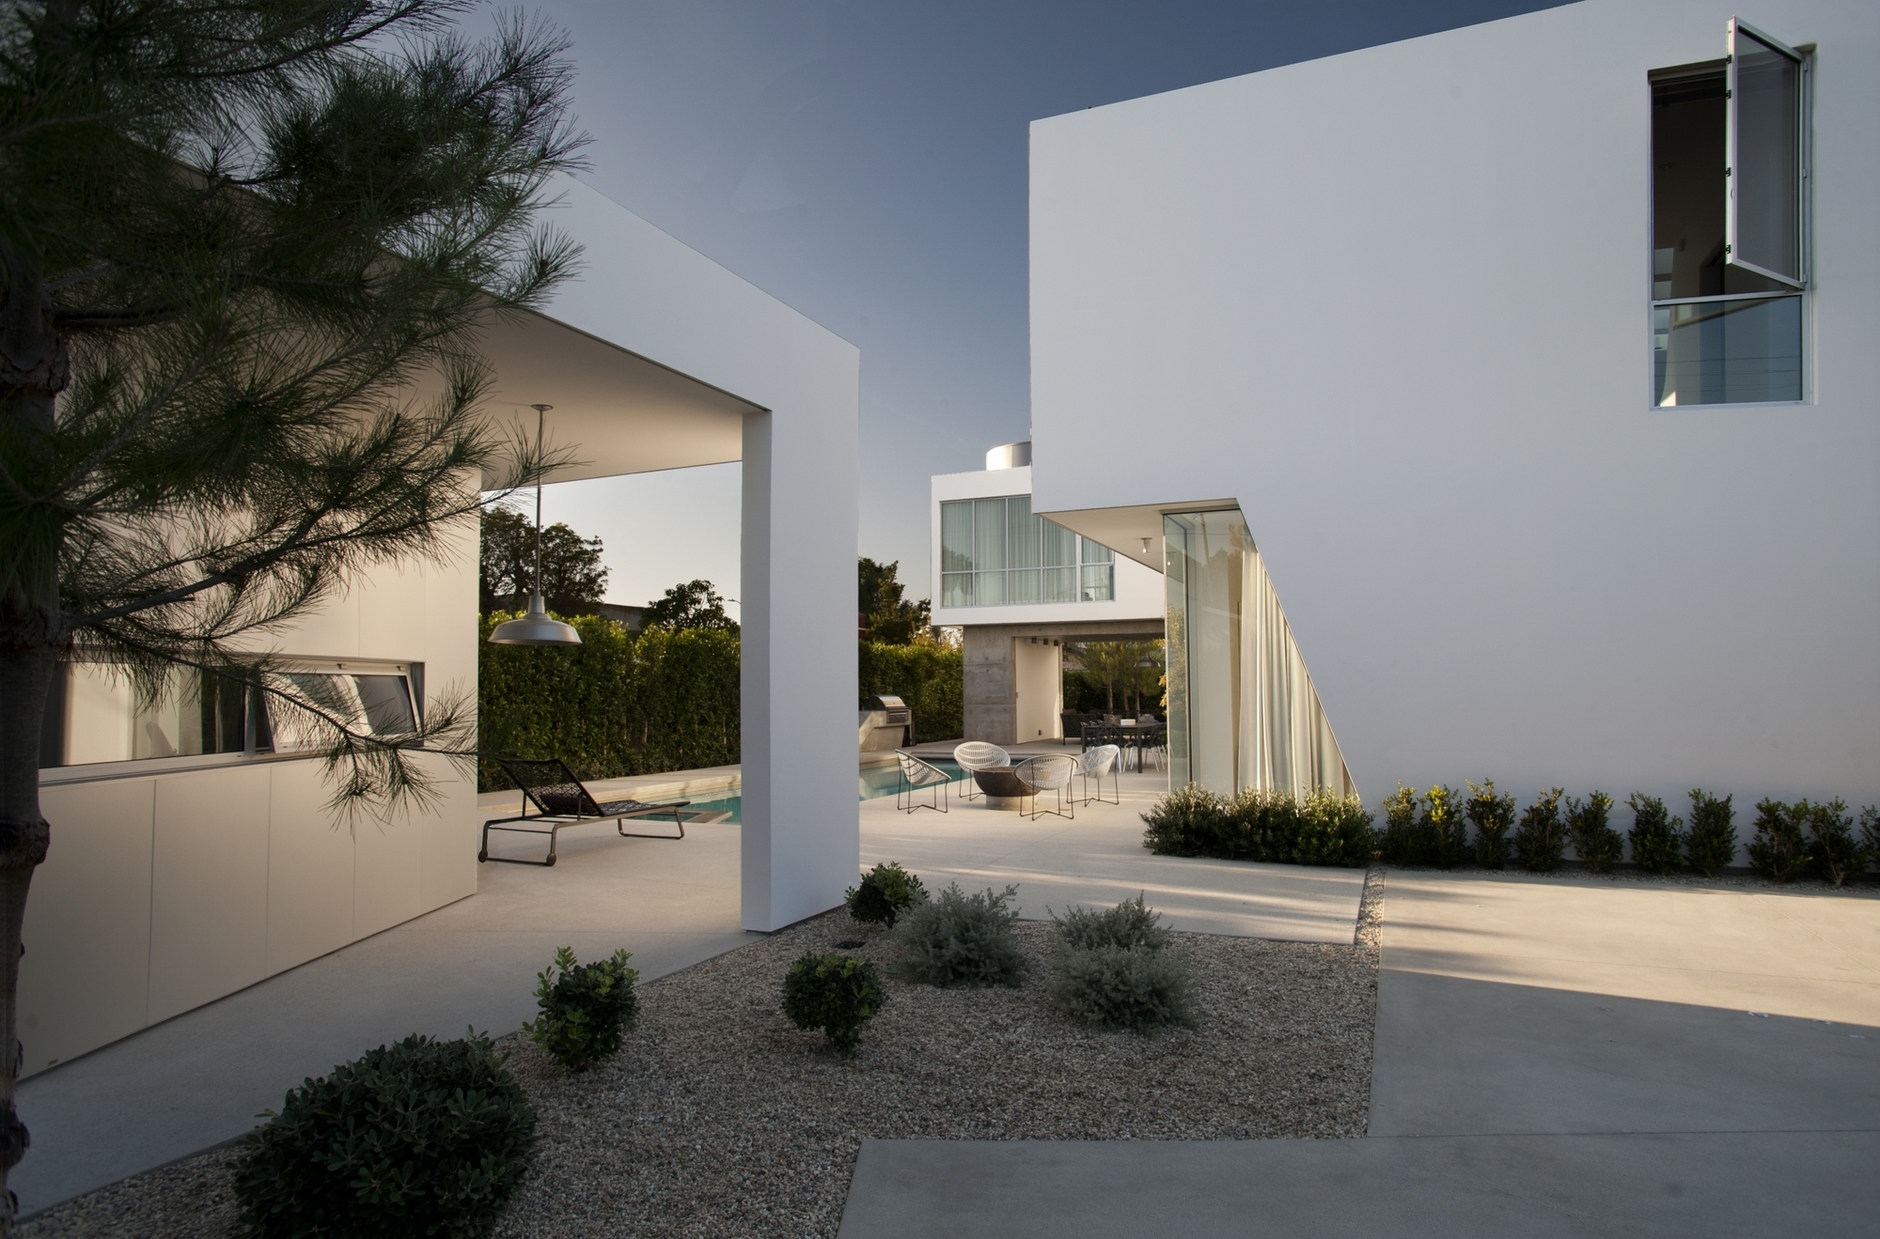 Modern family home by dennis gibbens architects karmatrendz for Modern family house 90210